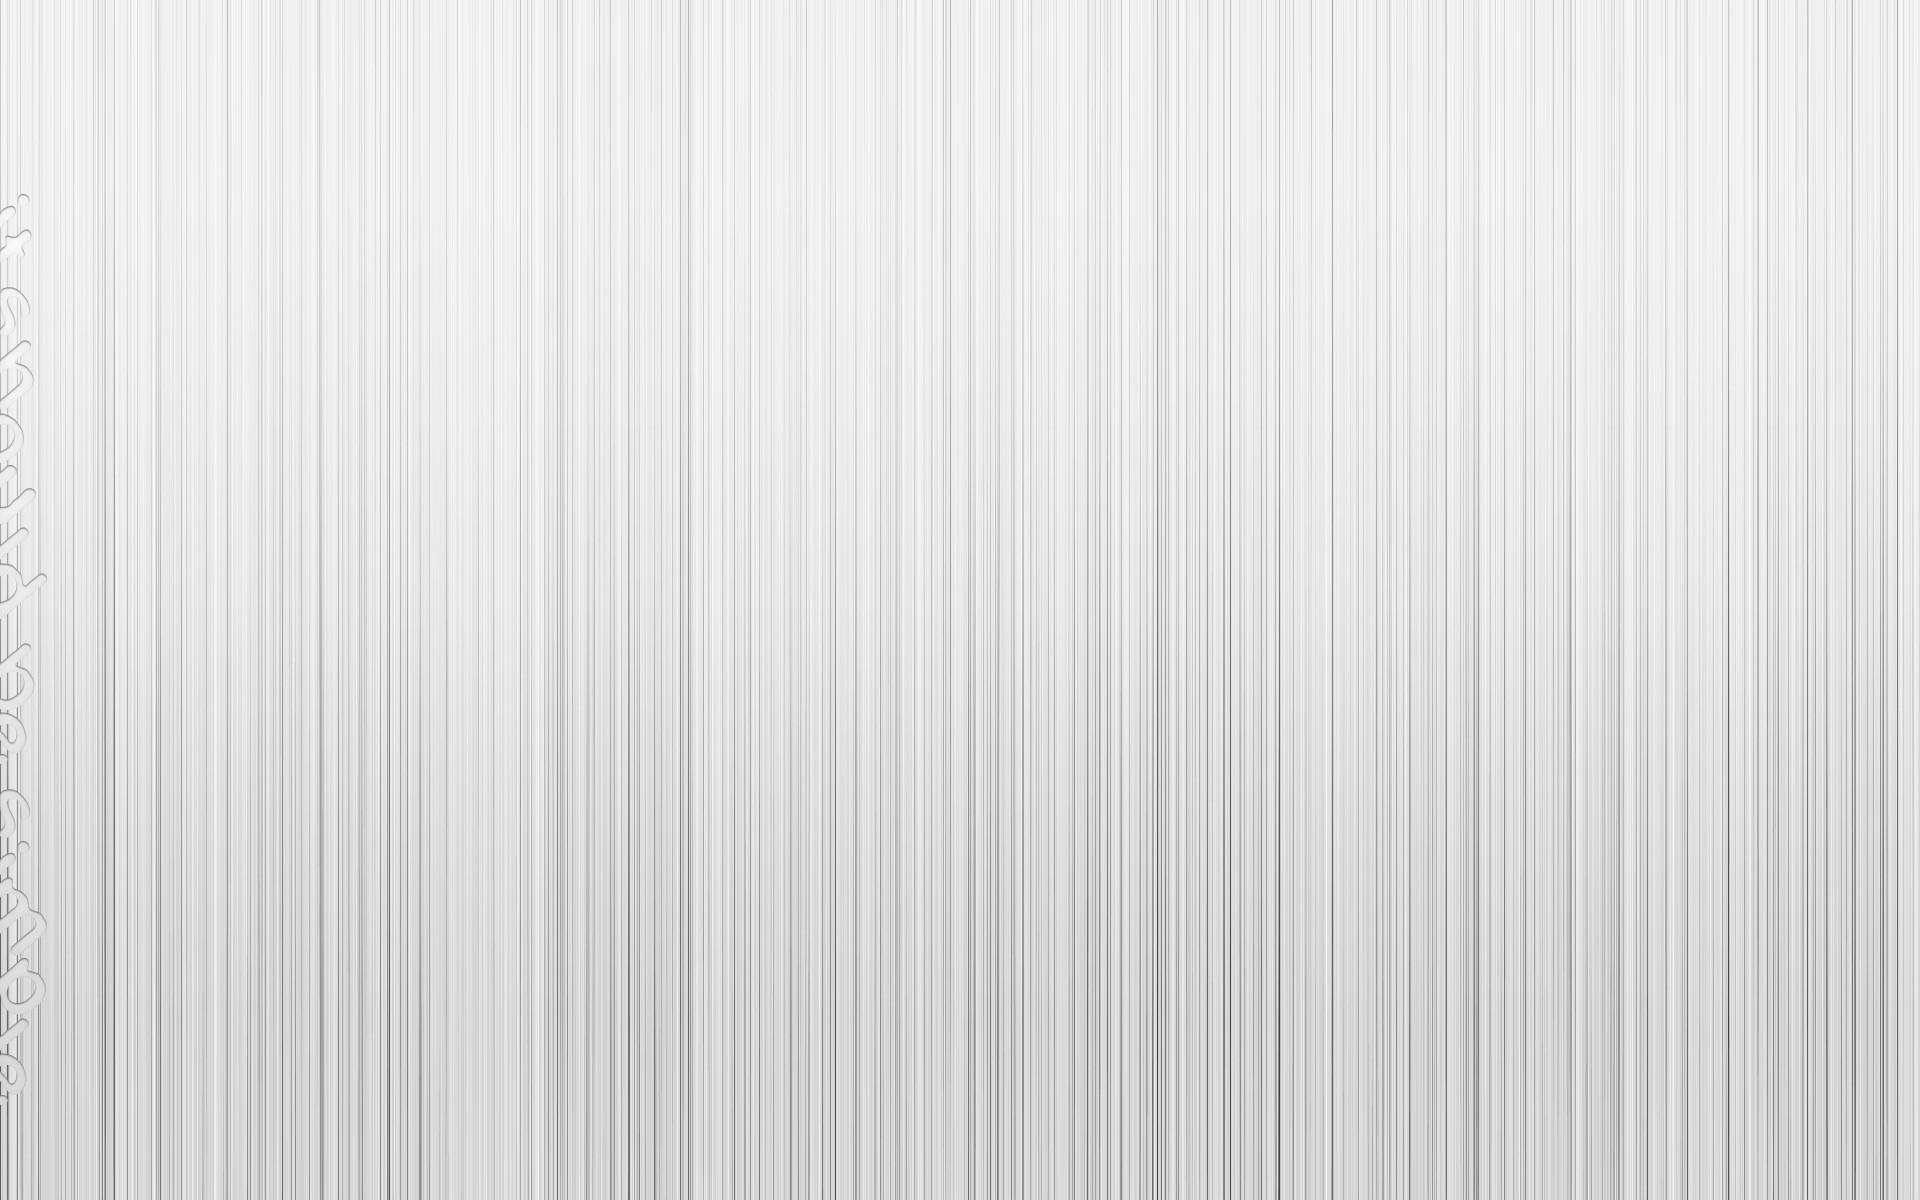 Cool Plain Backgrounds  68  Images